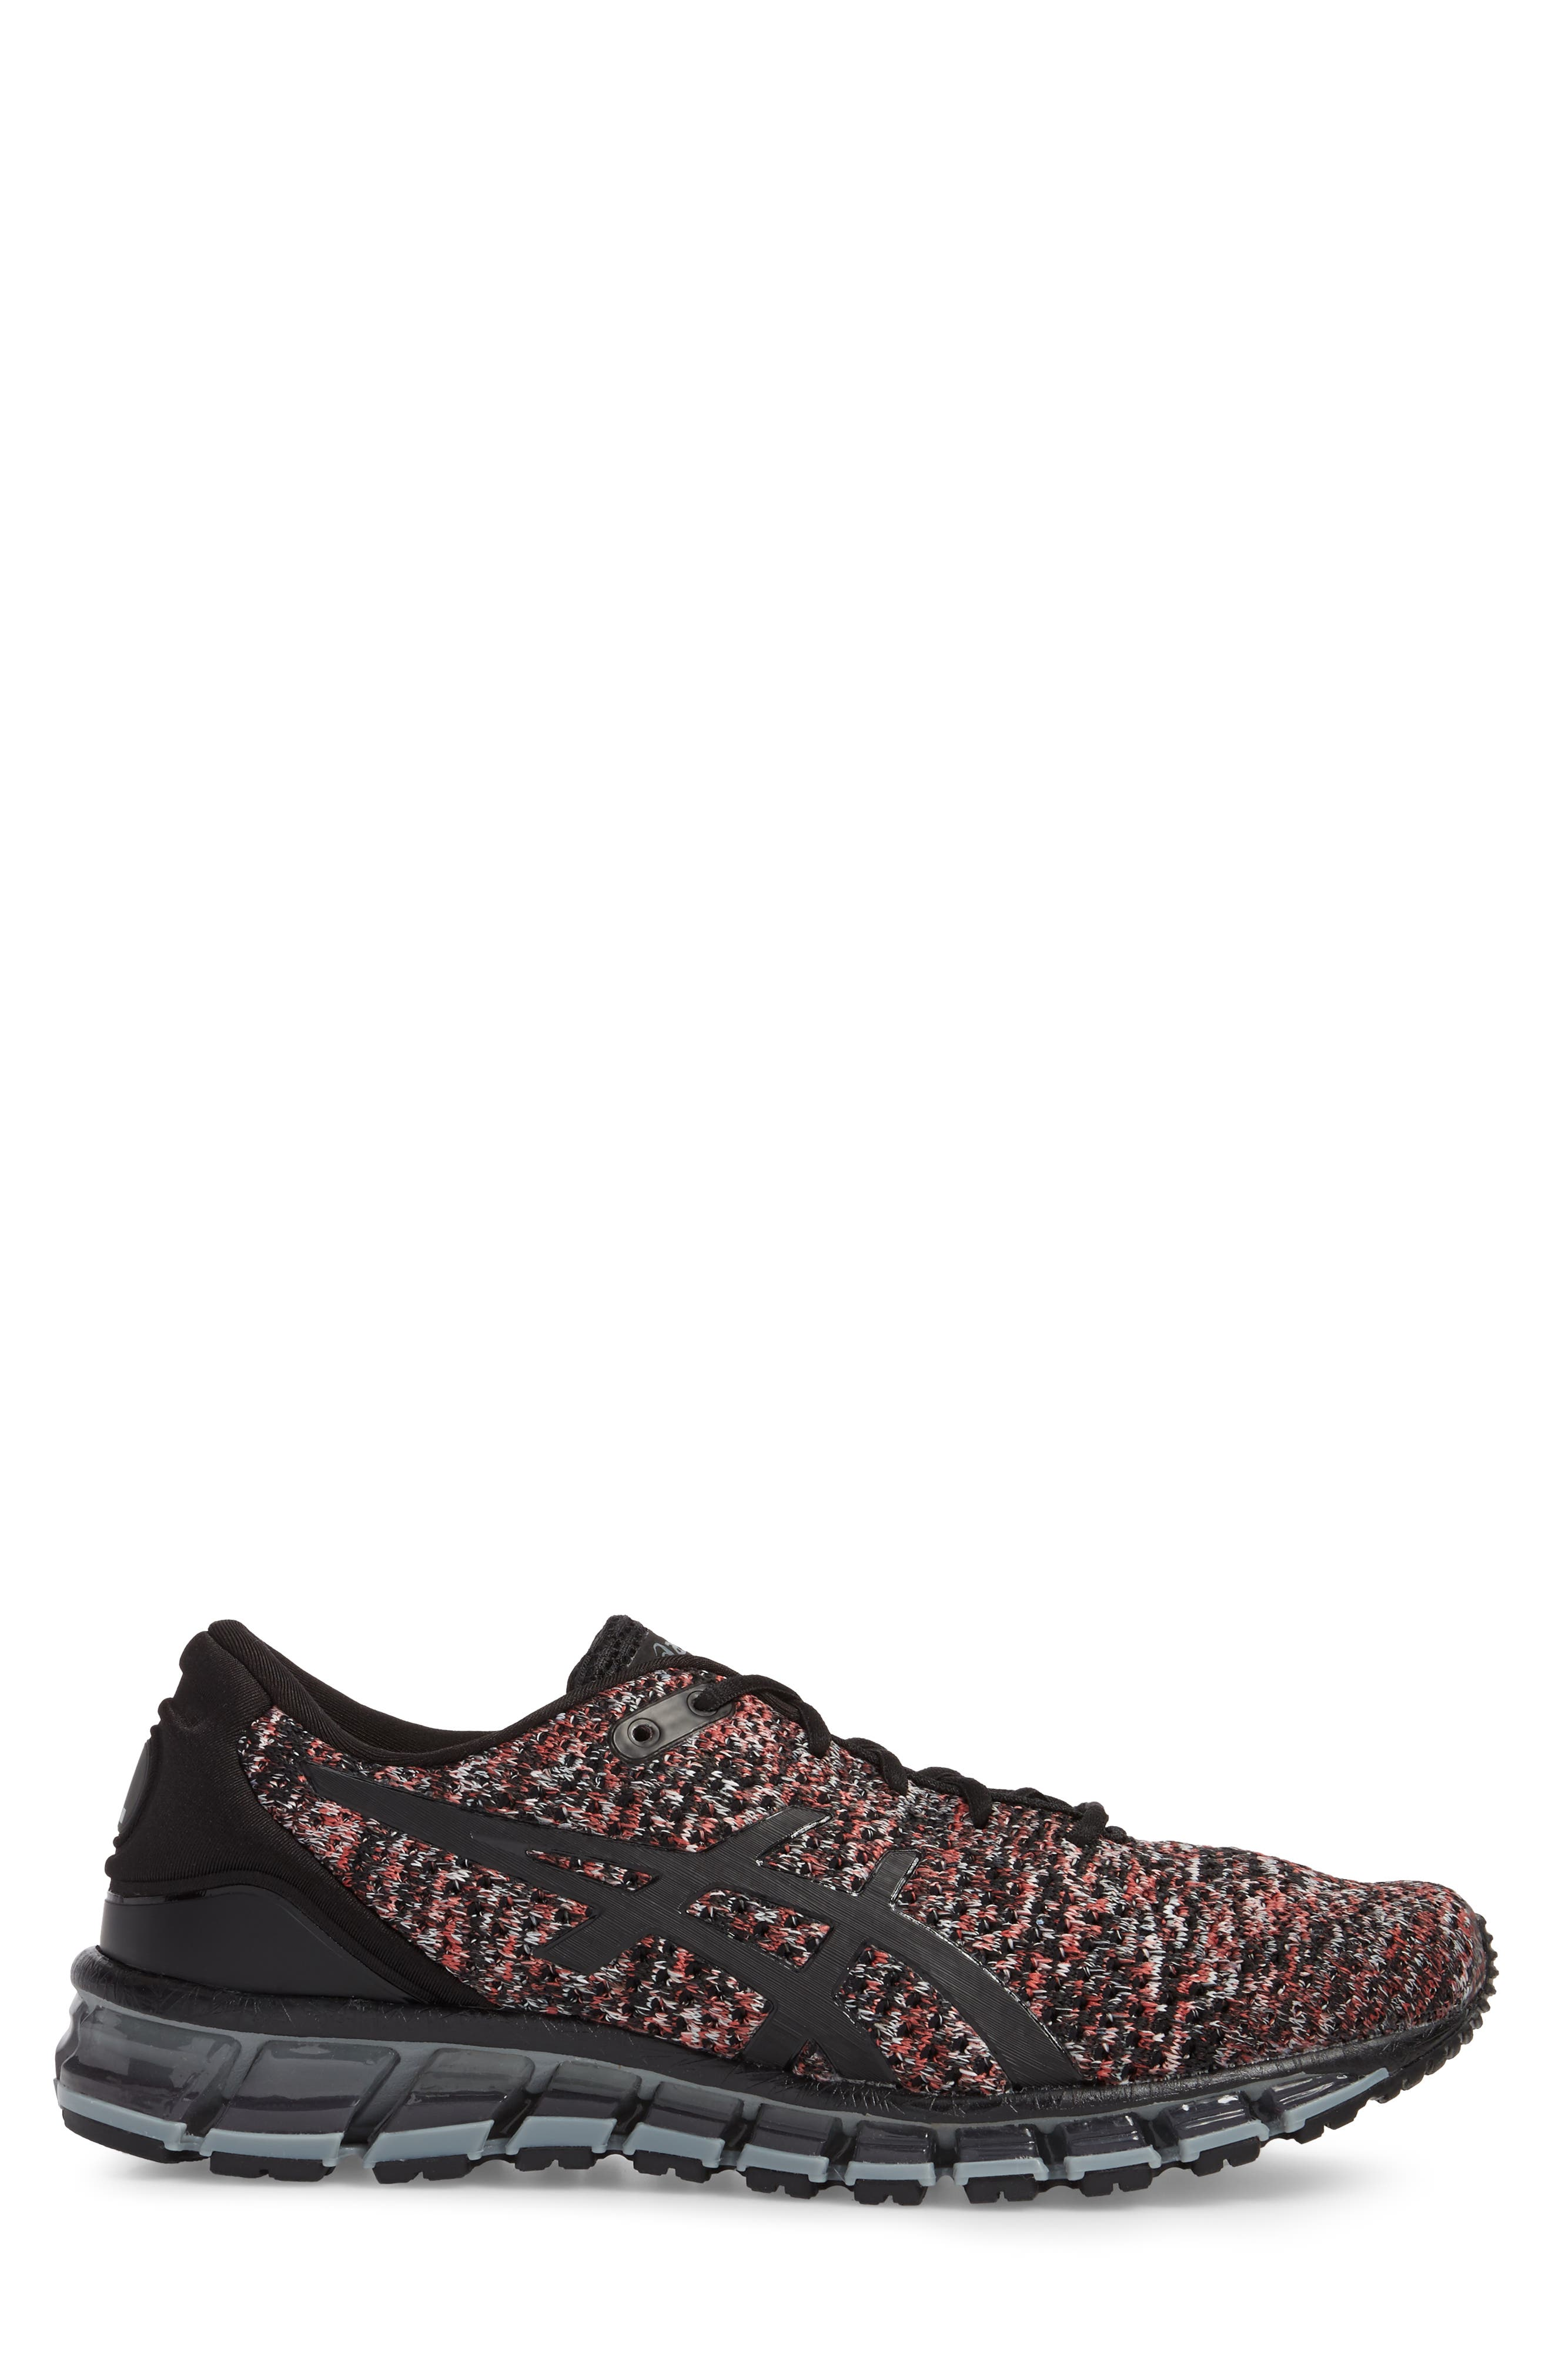 GEL-Quantum 360 Running Shoe,                             Alternate thumbnail 3, color,                             Black/ Class Red